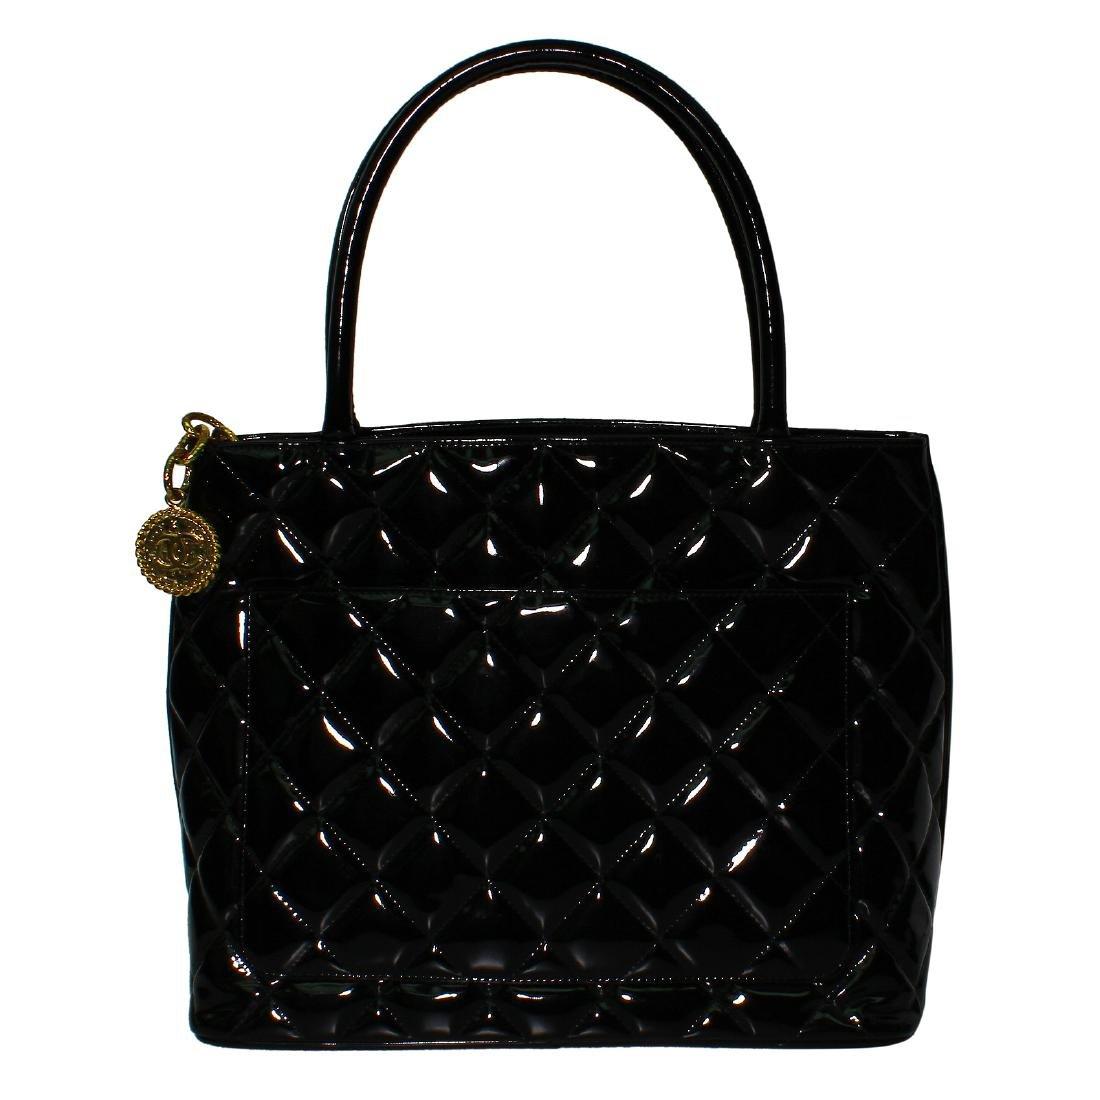 Chanel Quilted Black Patent Leather Shoulder Bag - 2